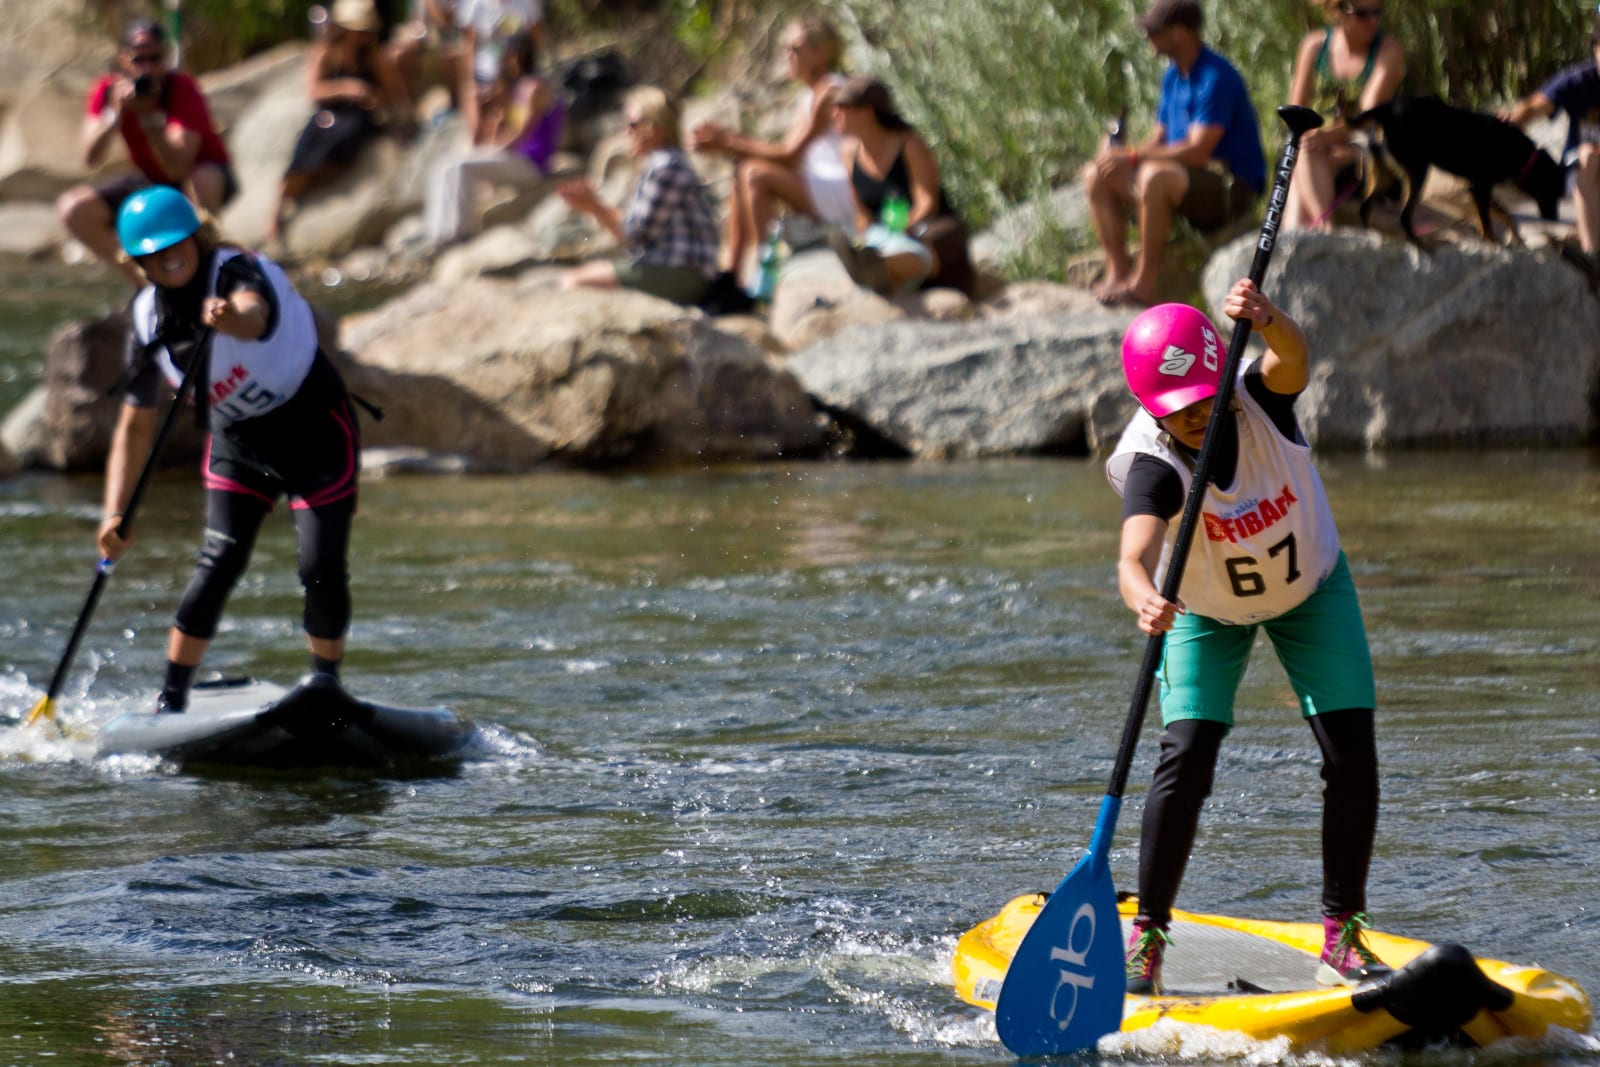 Colorado Watersports Stand Up Paddle Boarding Salida